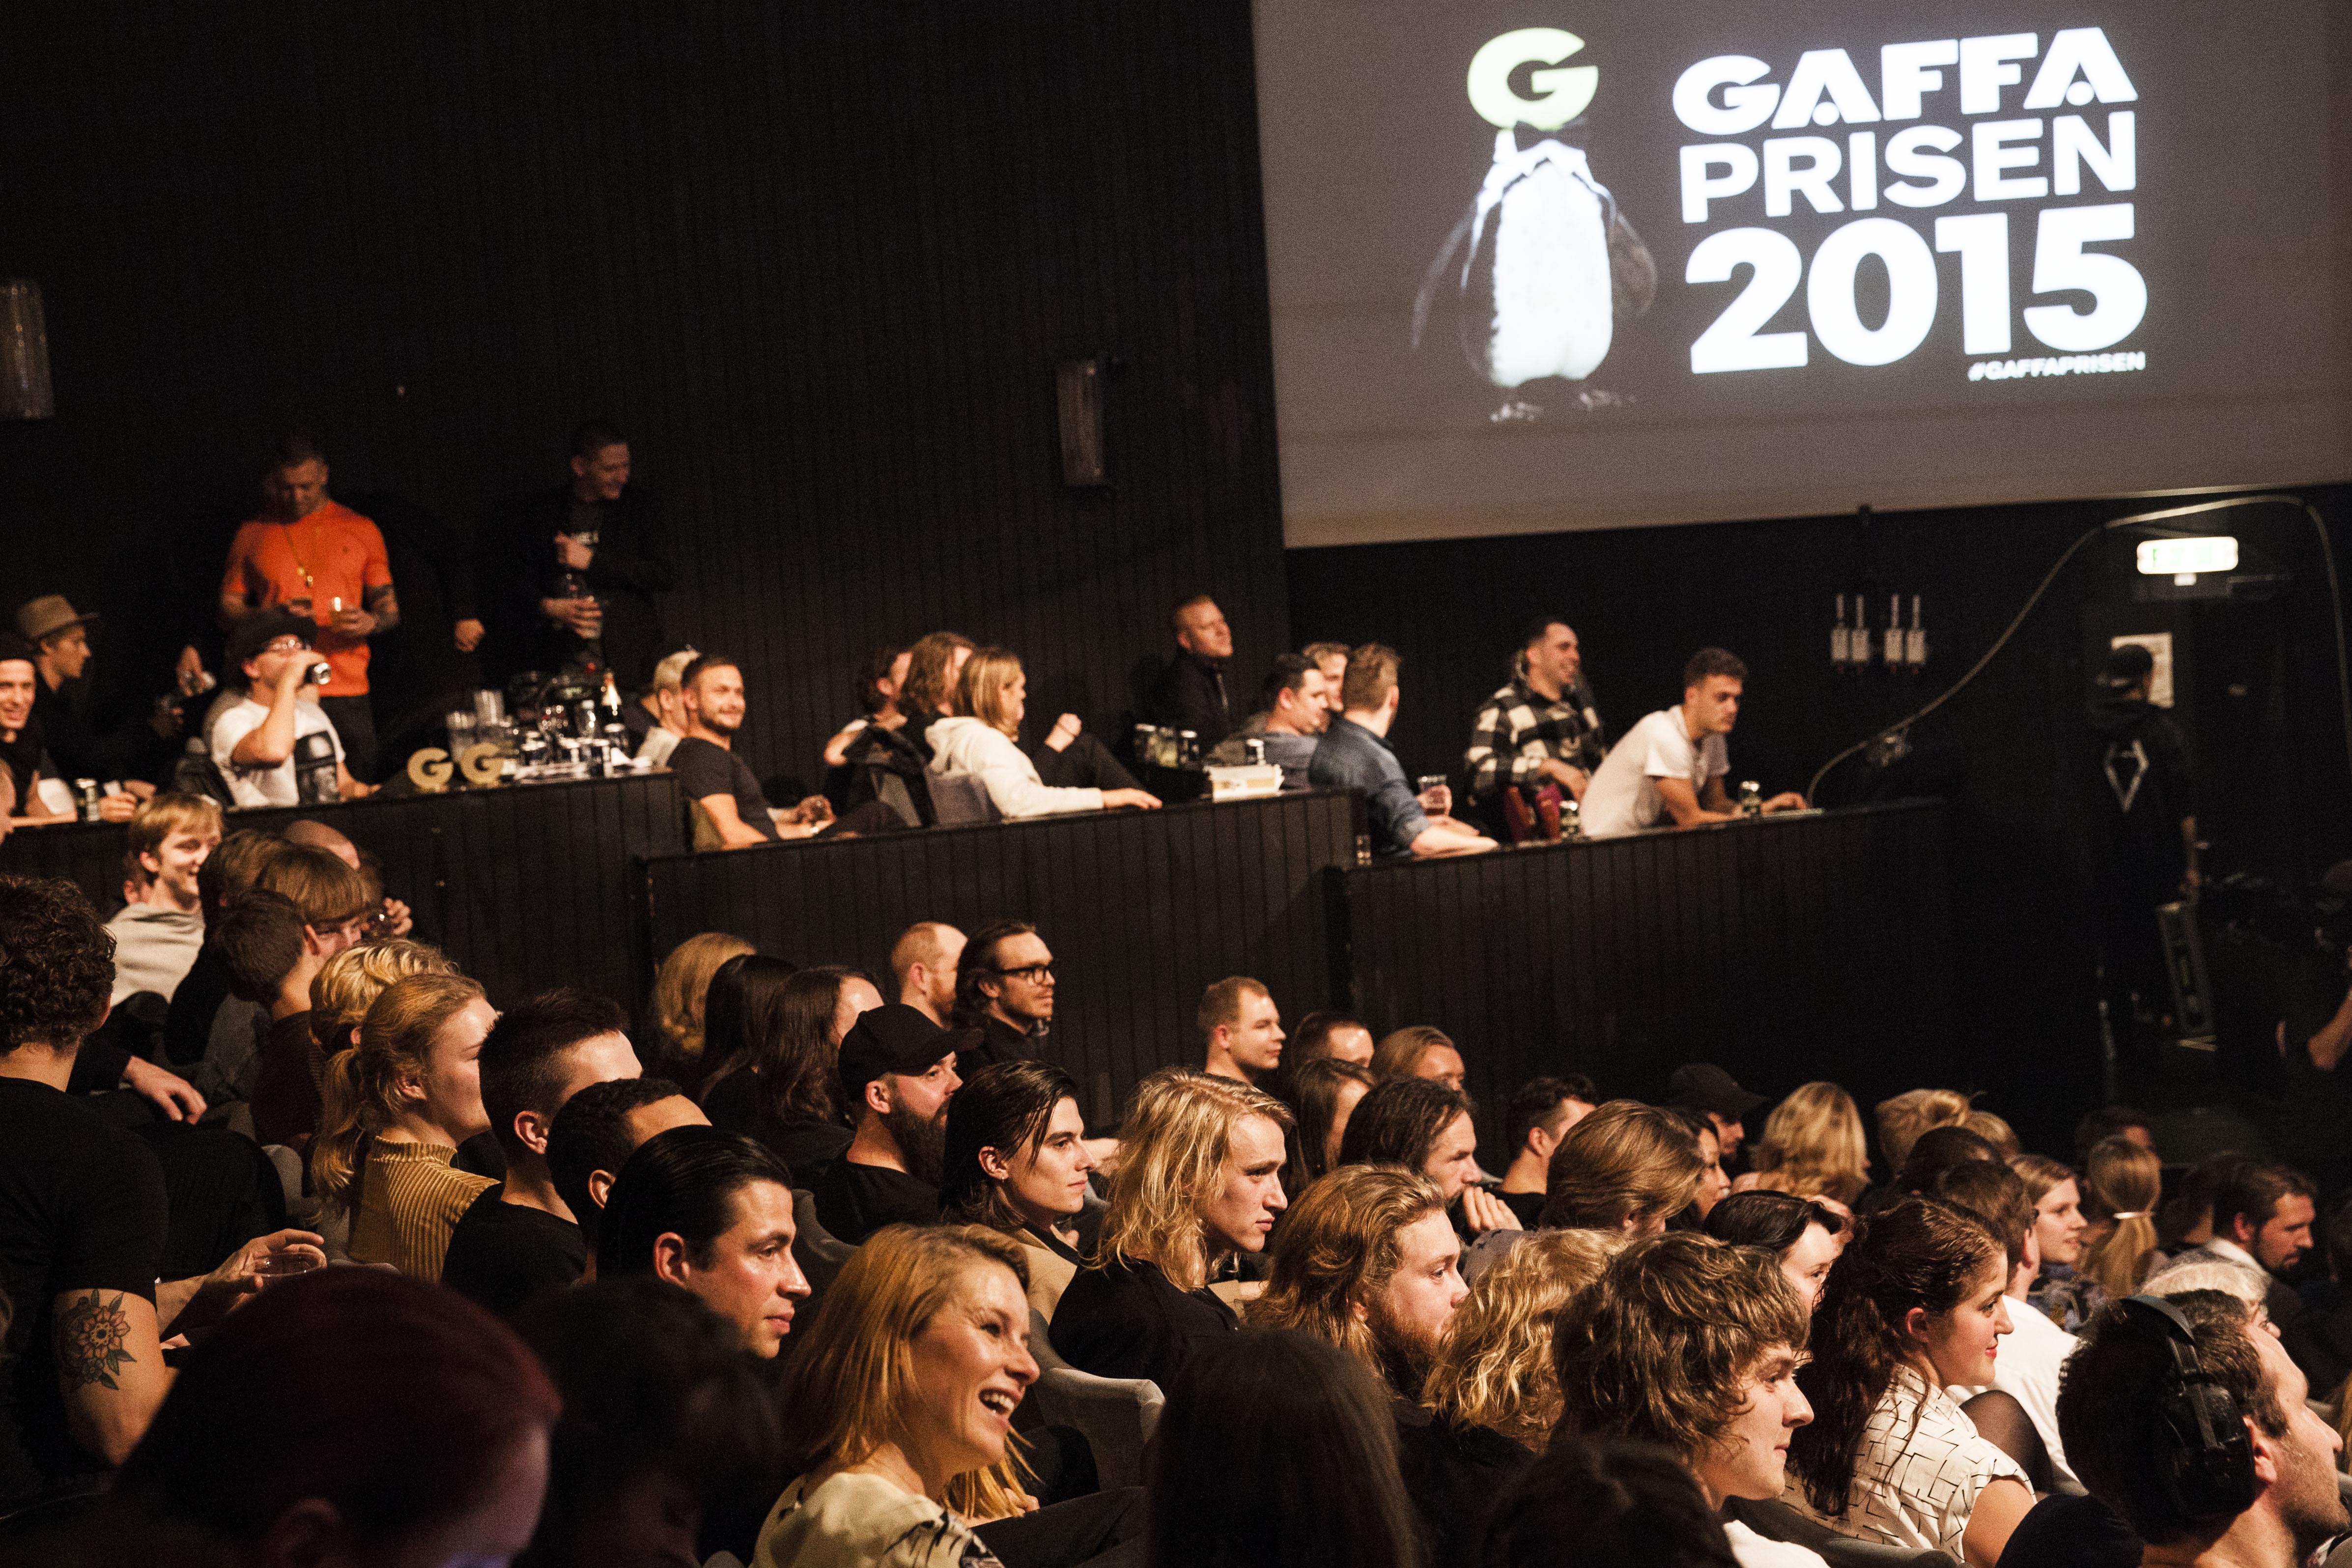 GAFFAprisen2015_HelenaLundquist_mindre_45